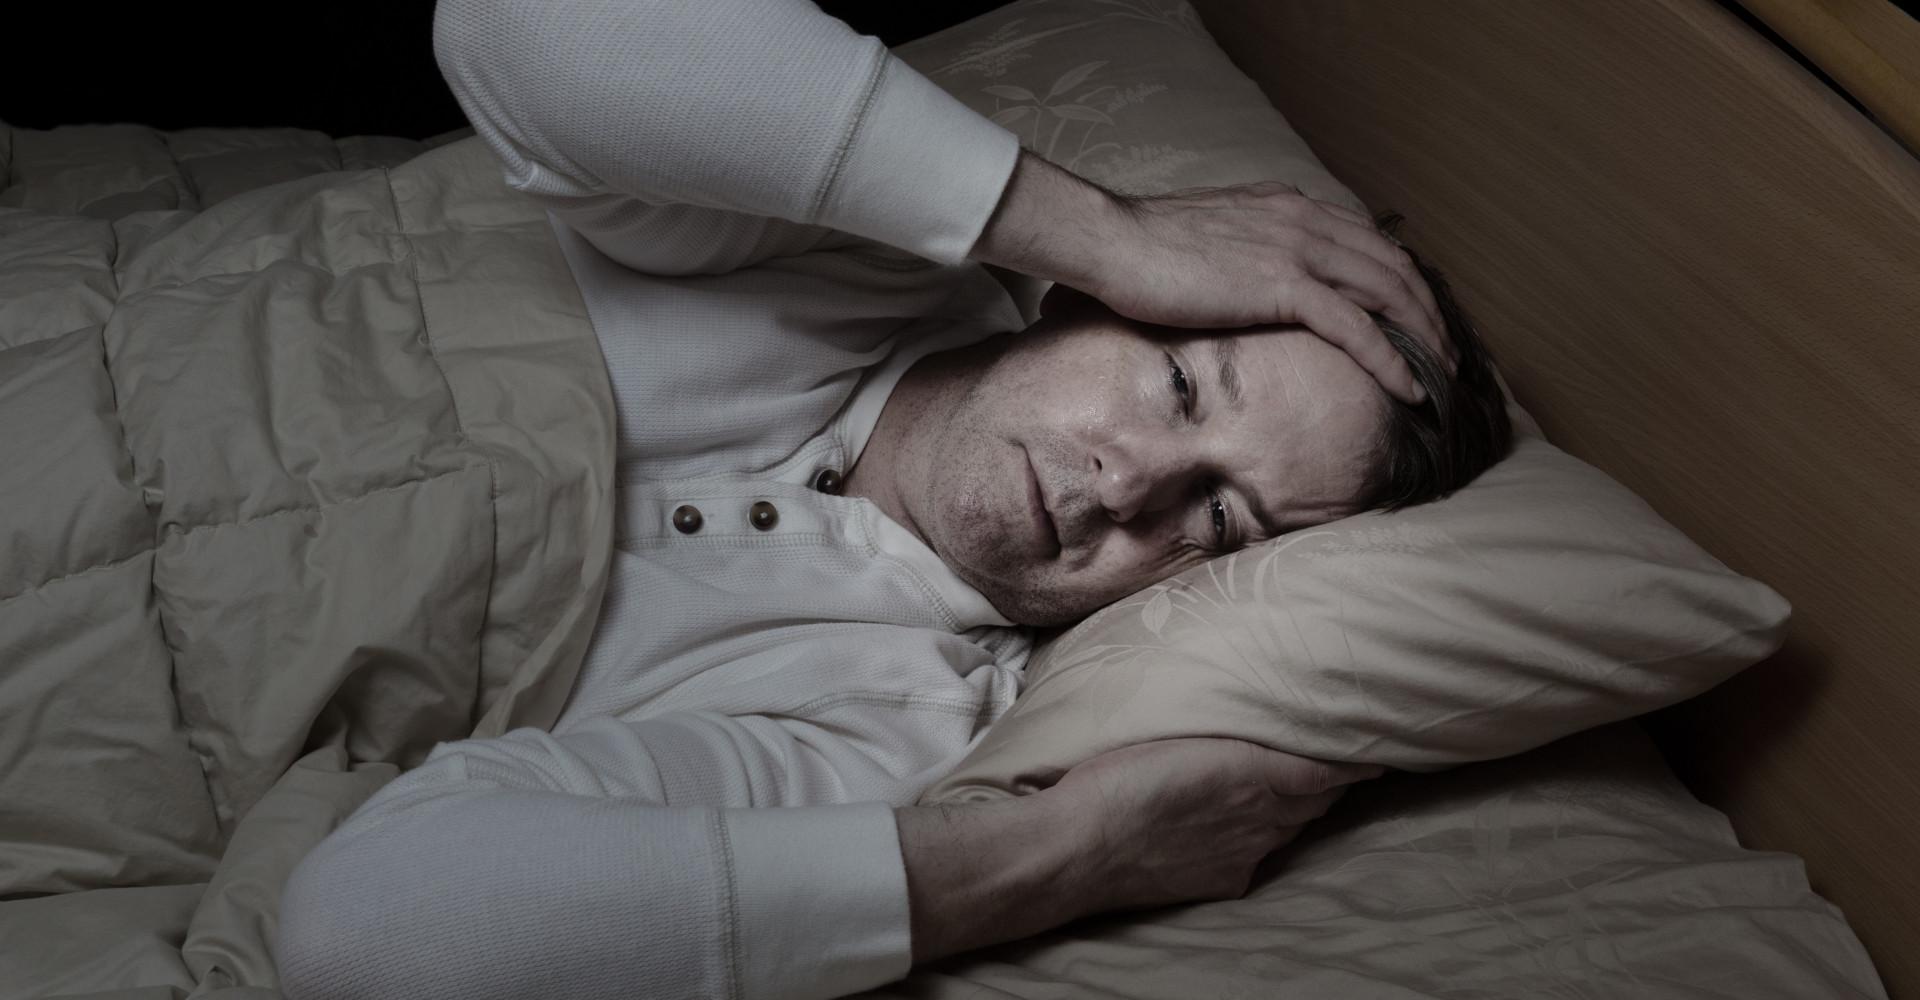 Dit is waarom je nooit met verwarming aan moet slapen